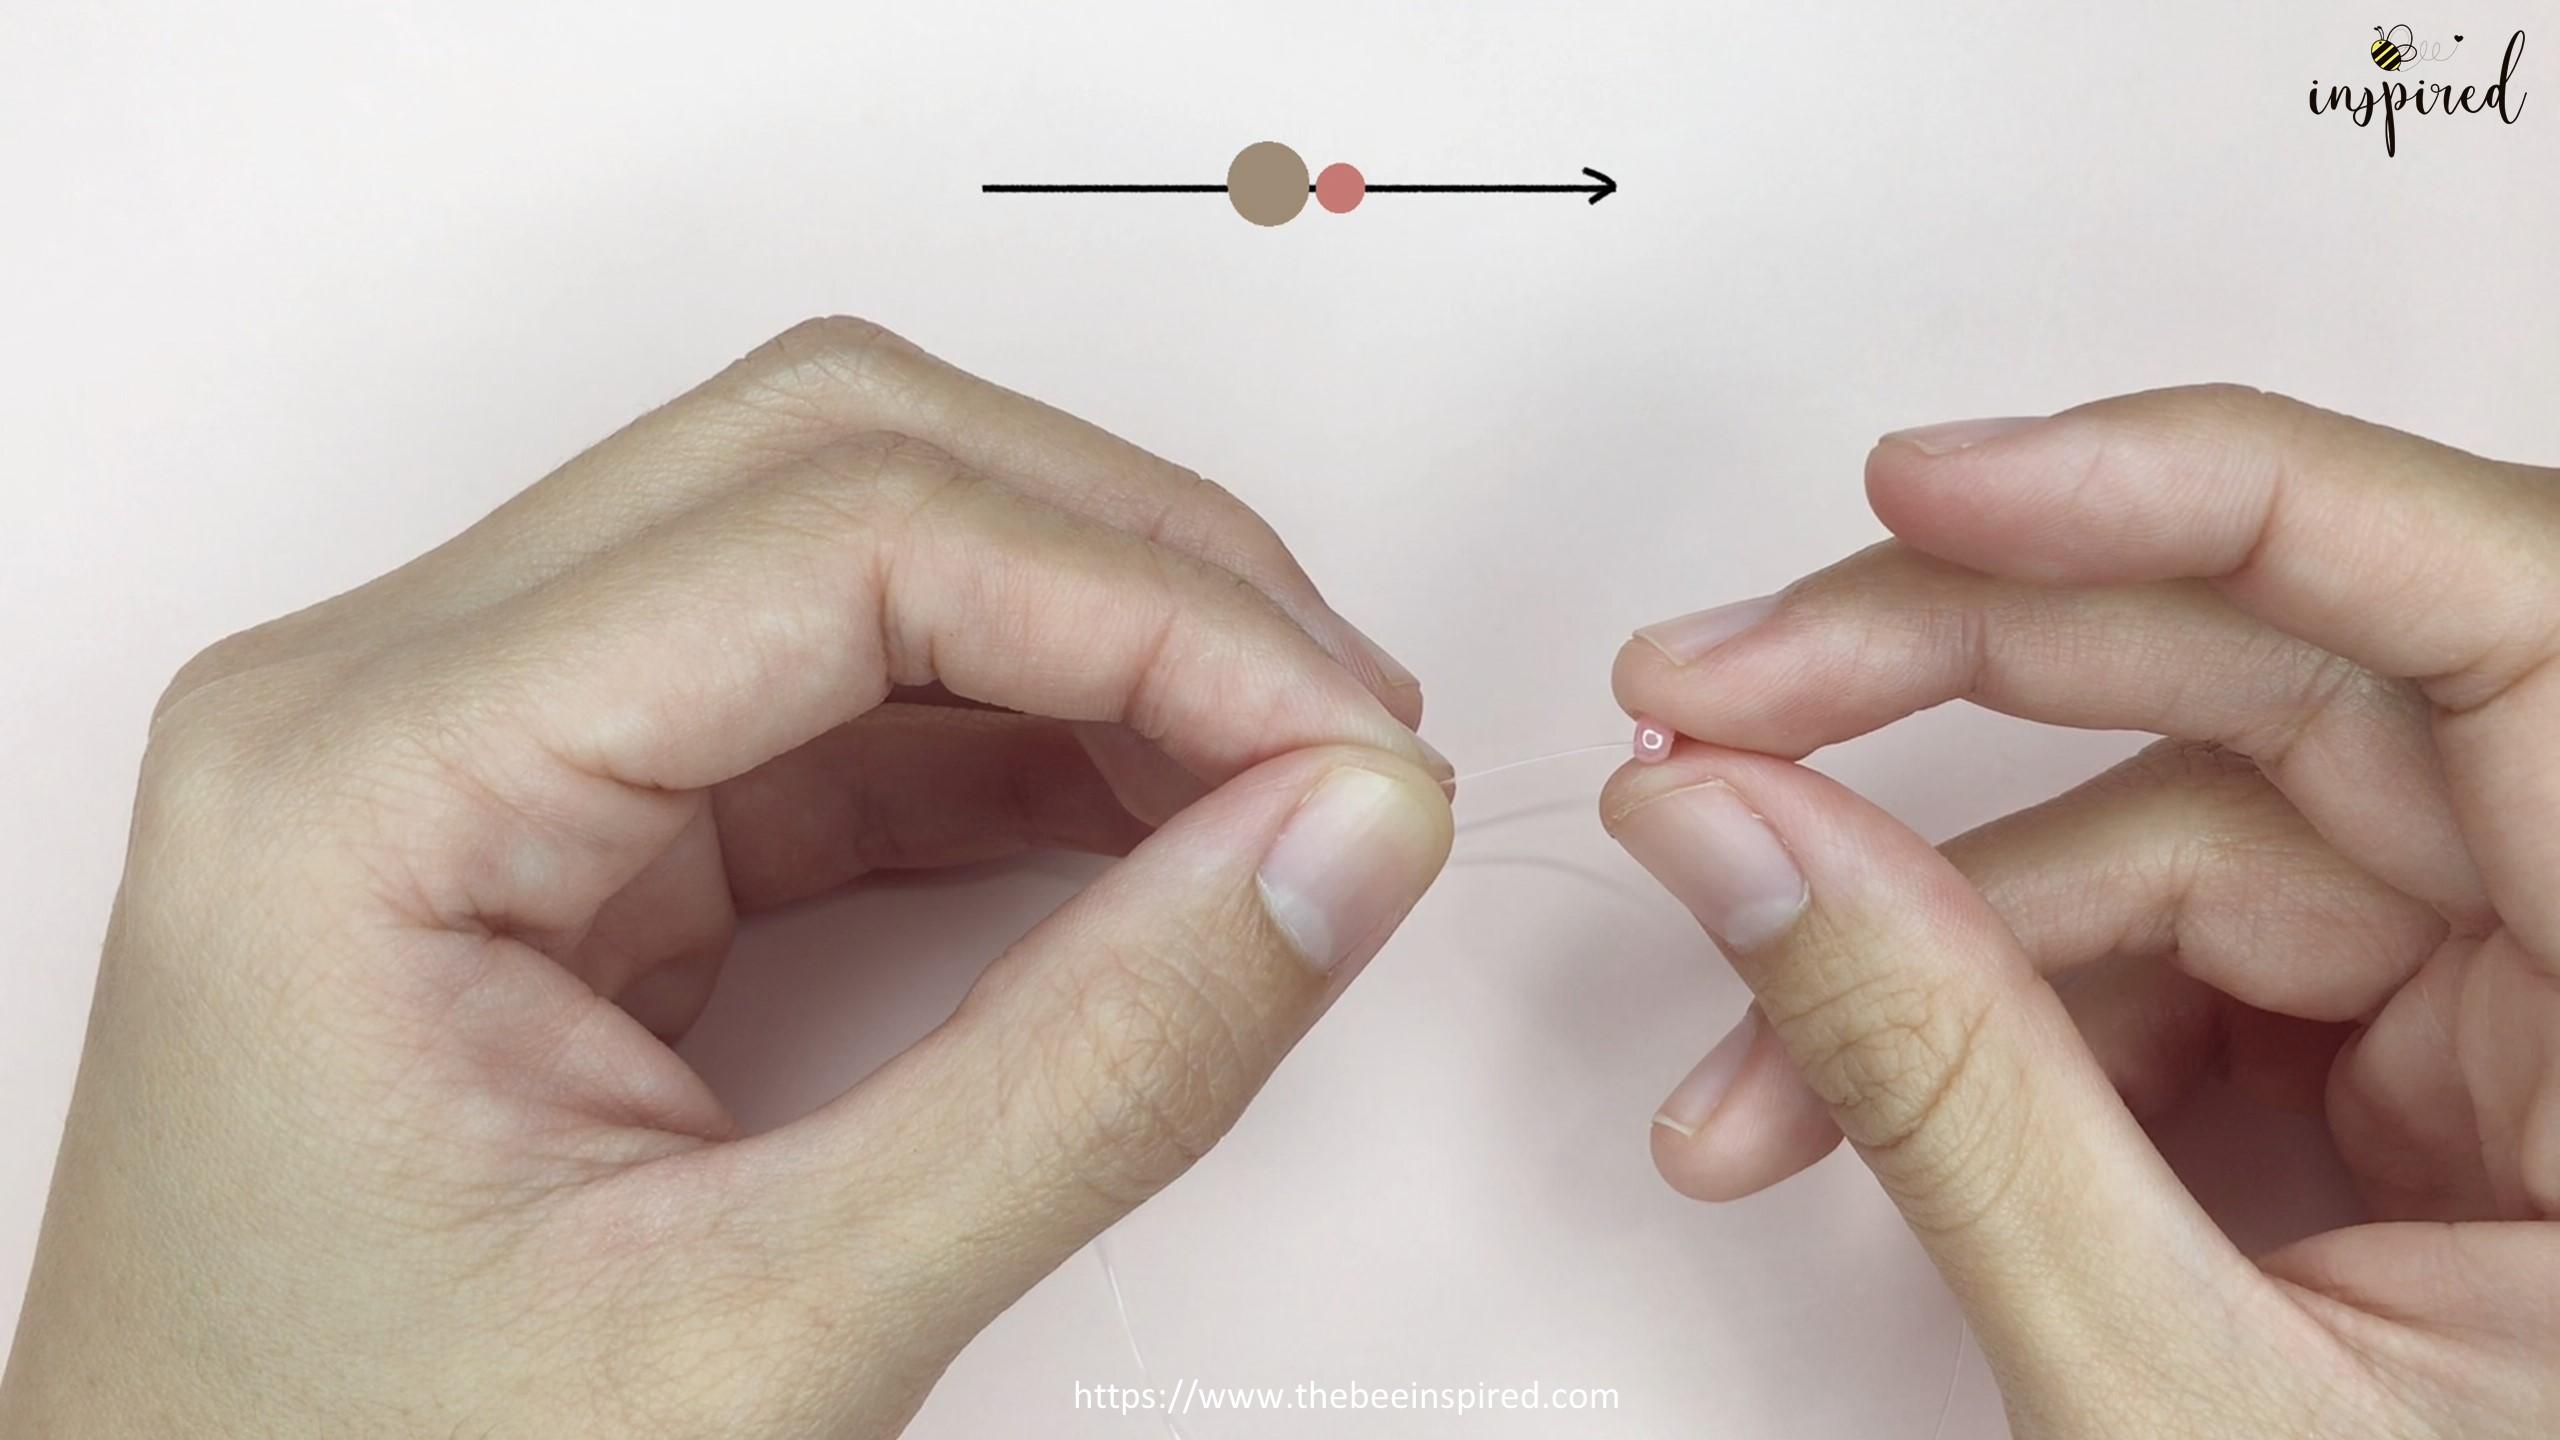 Easy DIY Beaded Ring วิธีทำแหวนลูกปัดง่ายๆ สไตล์เกาหลี_2